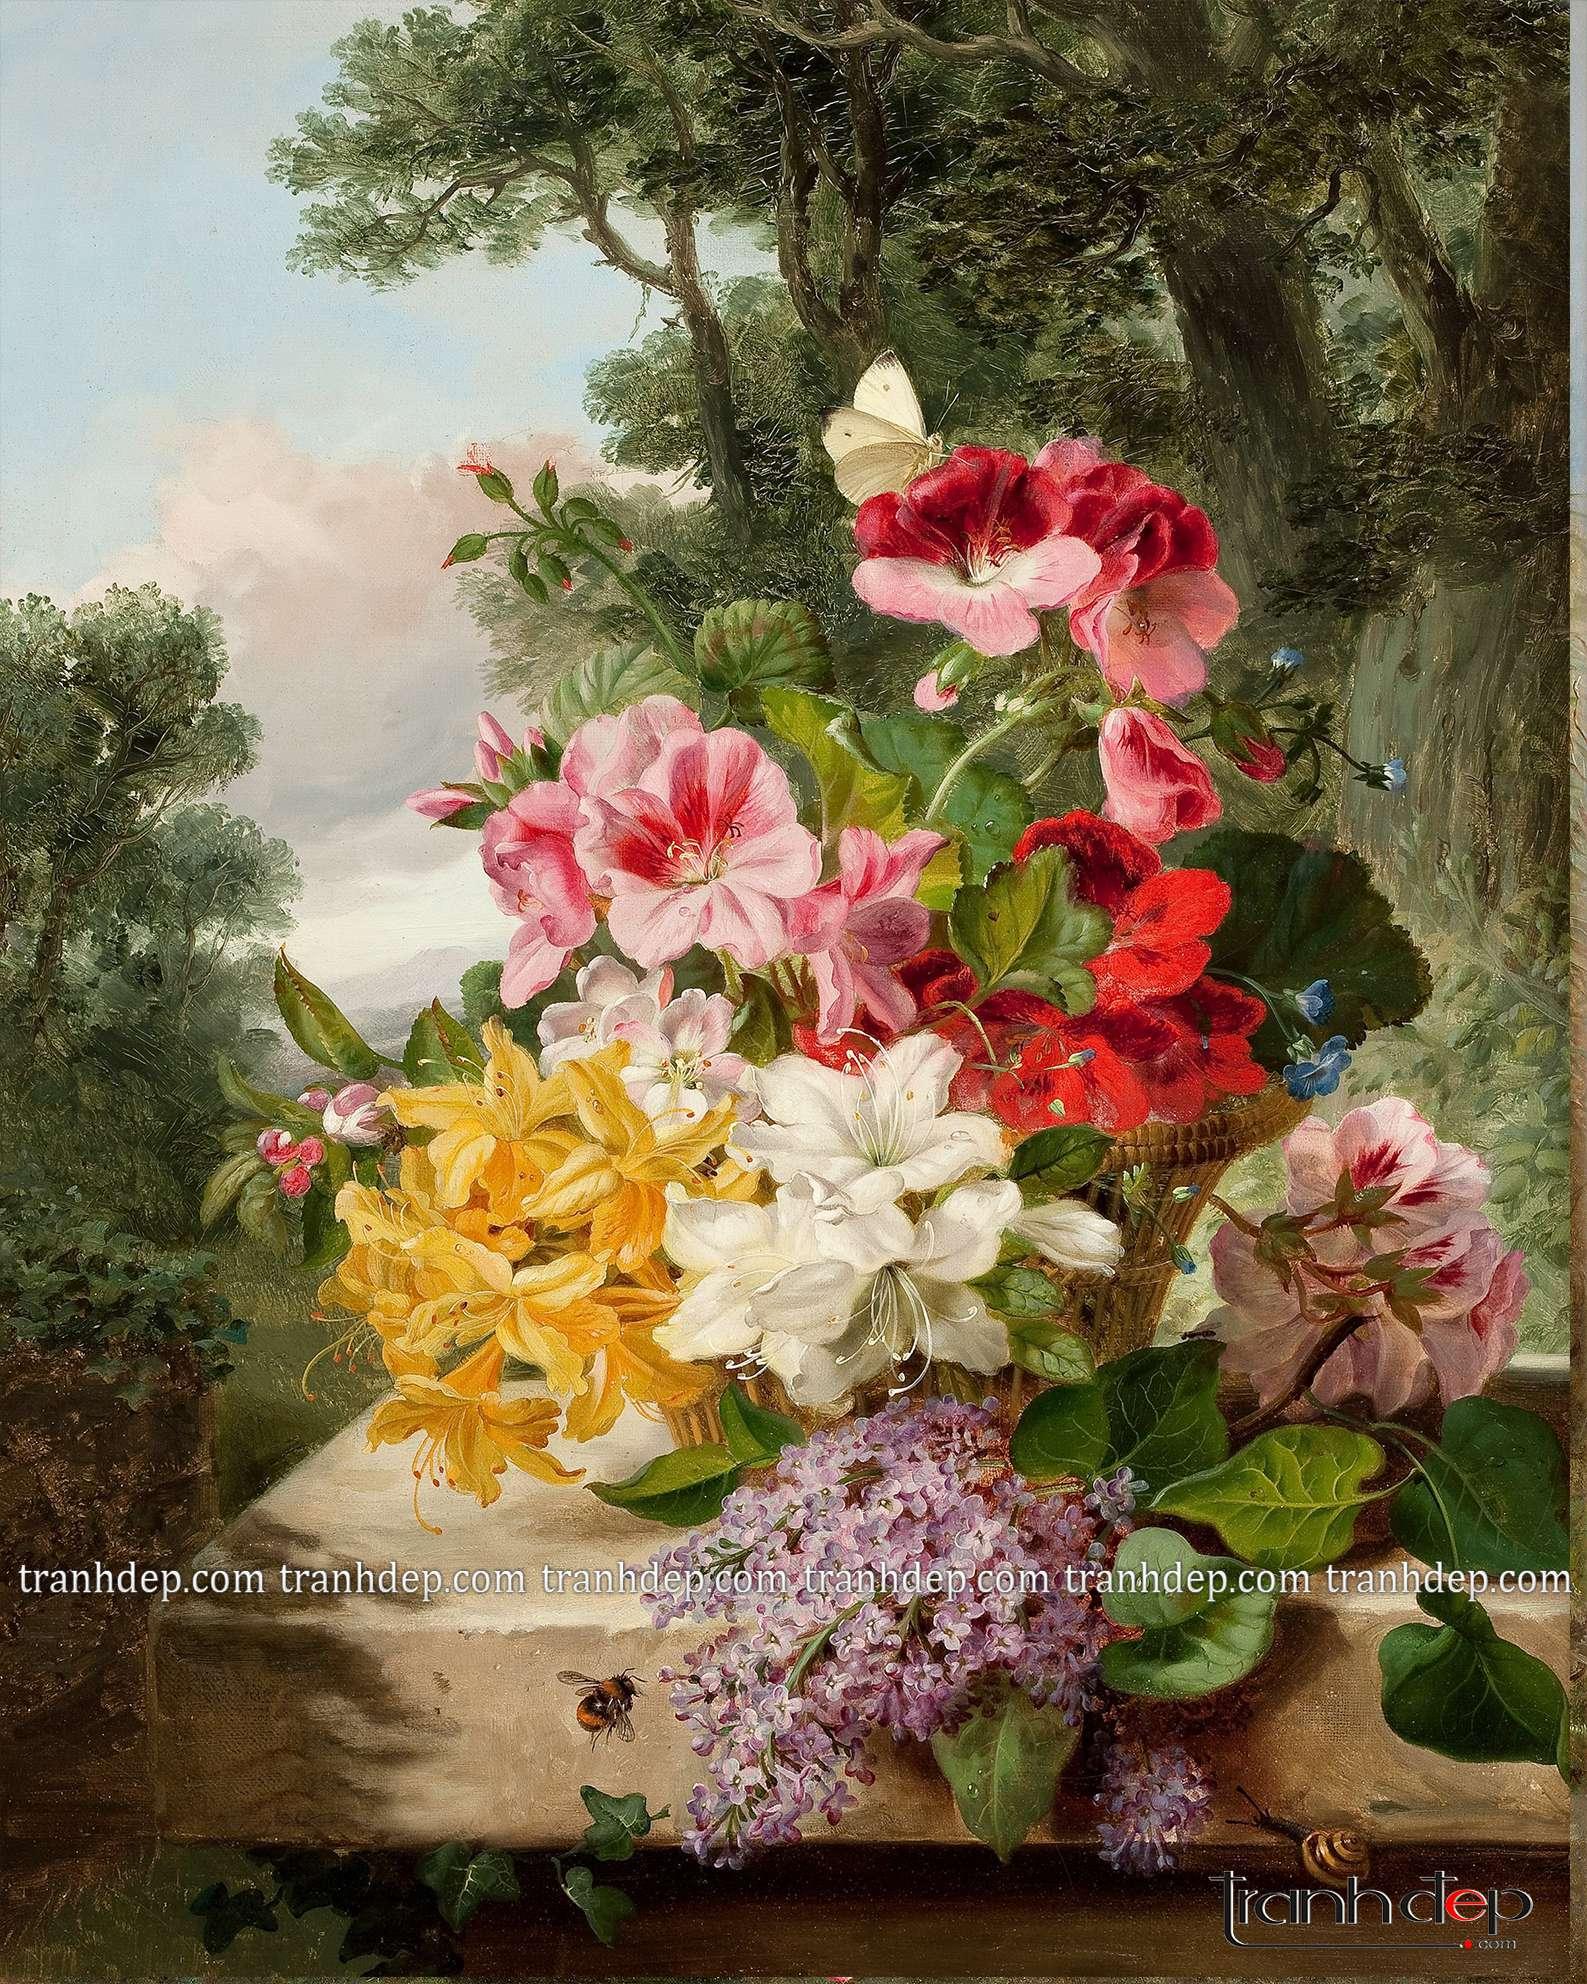 tranh tinh vat hoa co dien sang trong quy toc